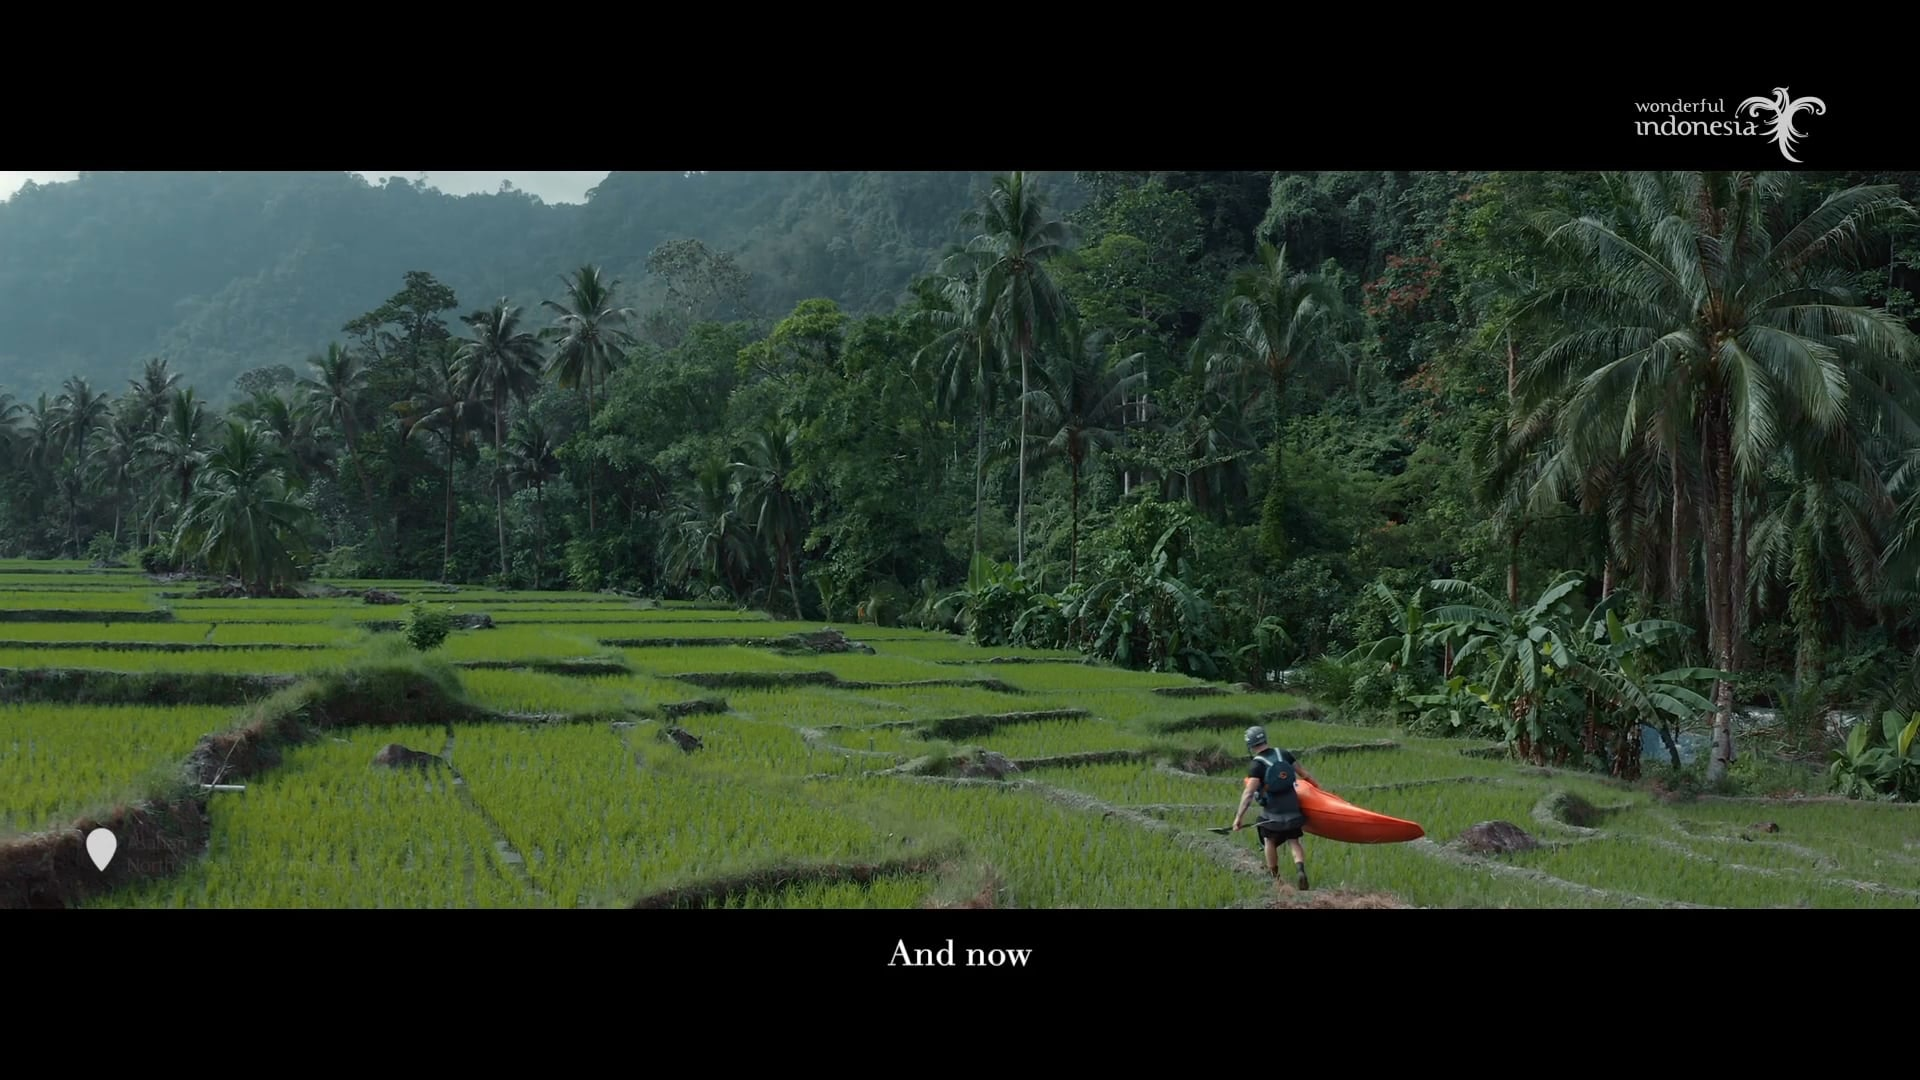 Wonderful Indonesia - The heart beat of Toba